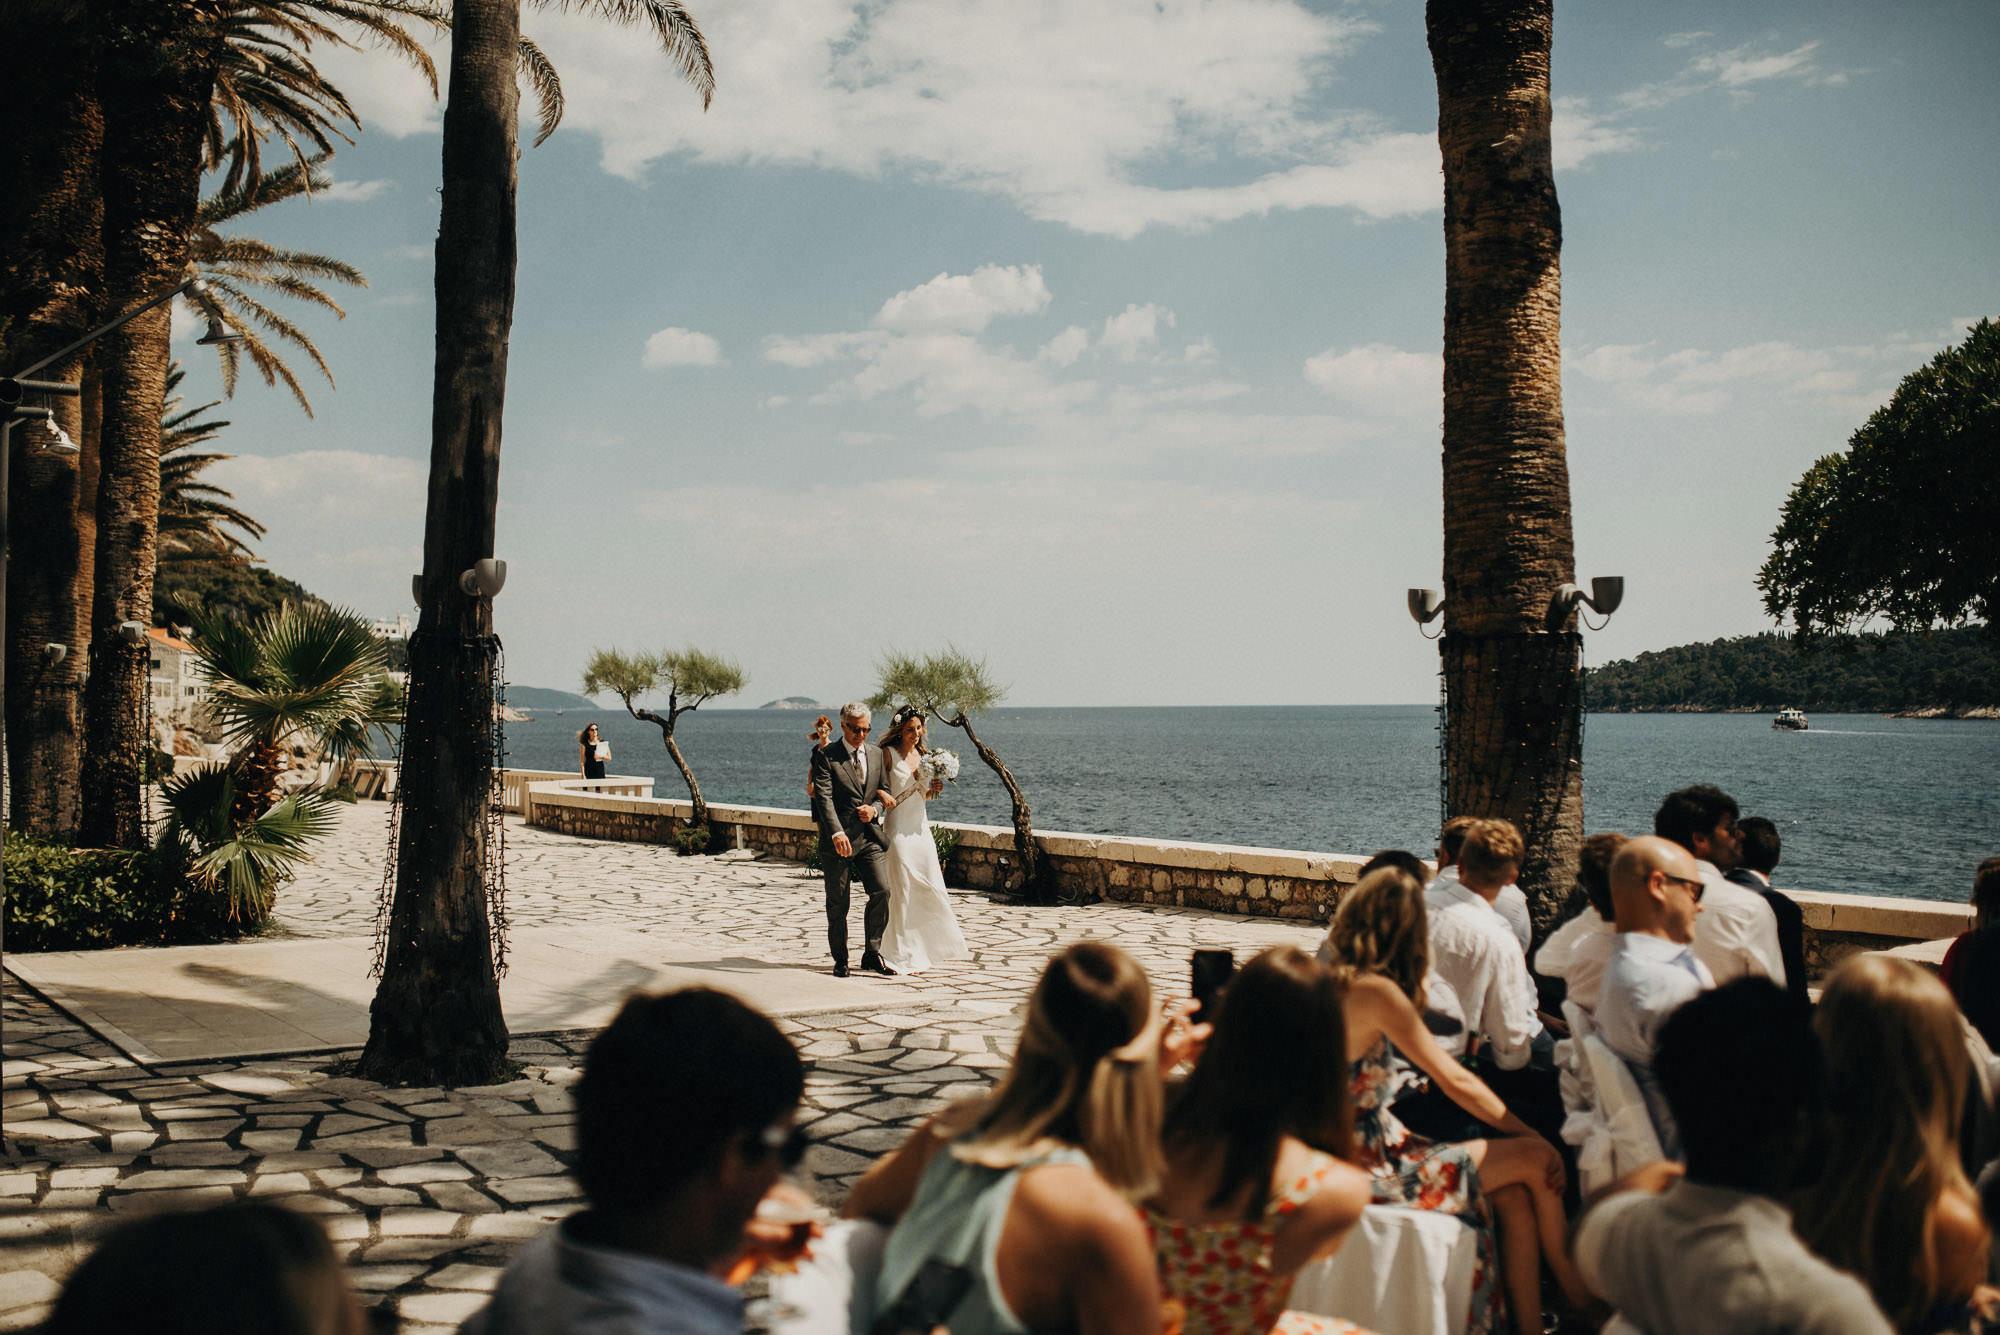 dubrovnik_croatia_wedding_photographer-jere_satamo-destination_weddings-040-web.jpg